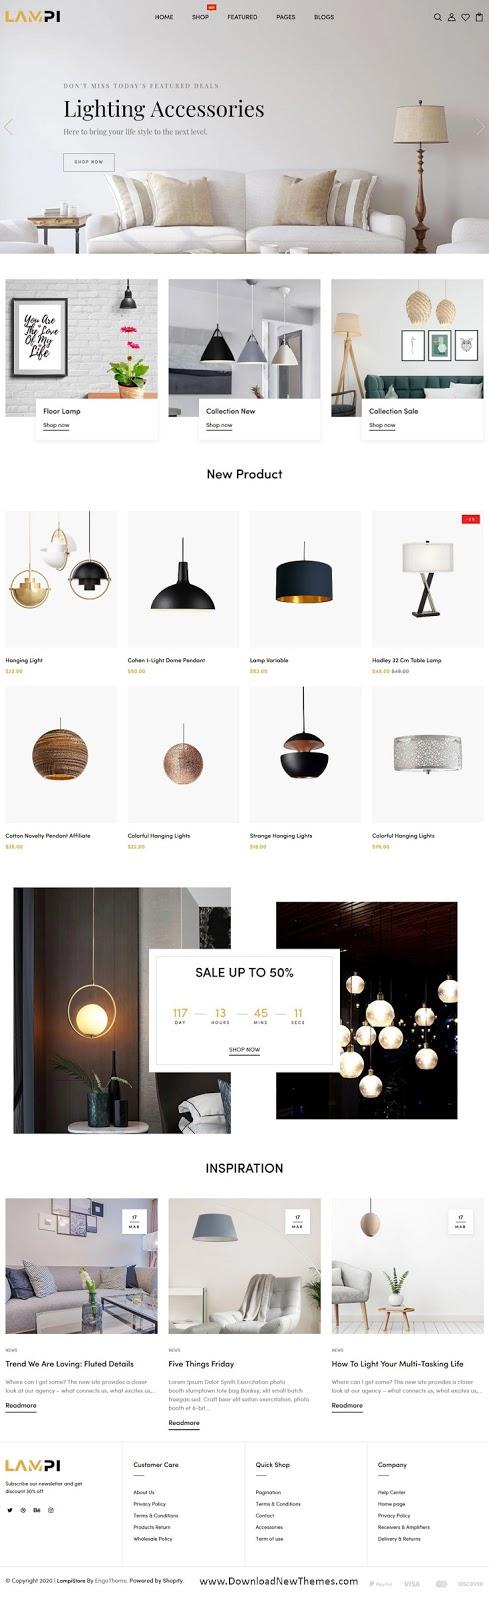 Lamp & Luxury Lights Responsive Shopify Theme